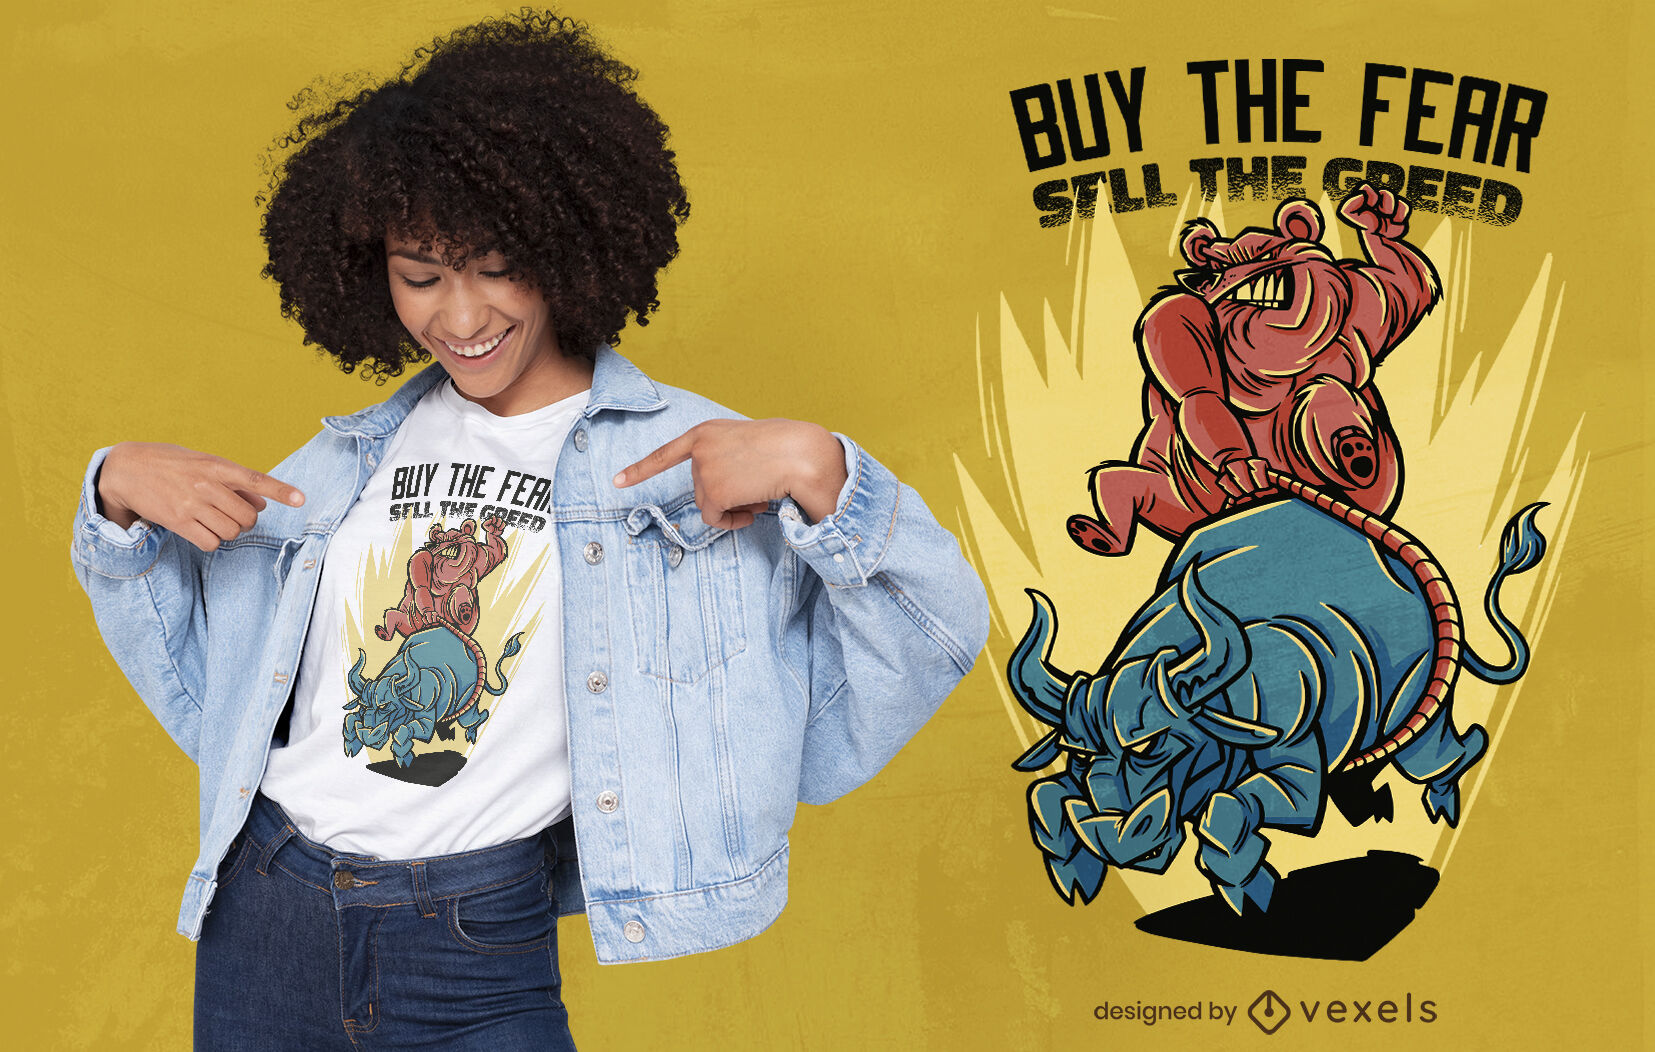 Buy the fear t-shirt design